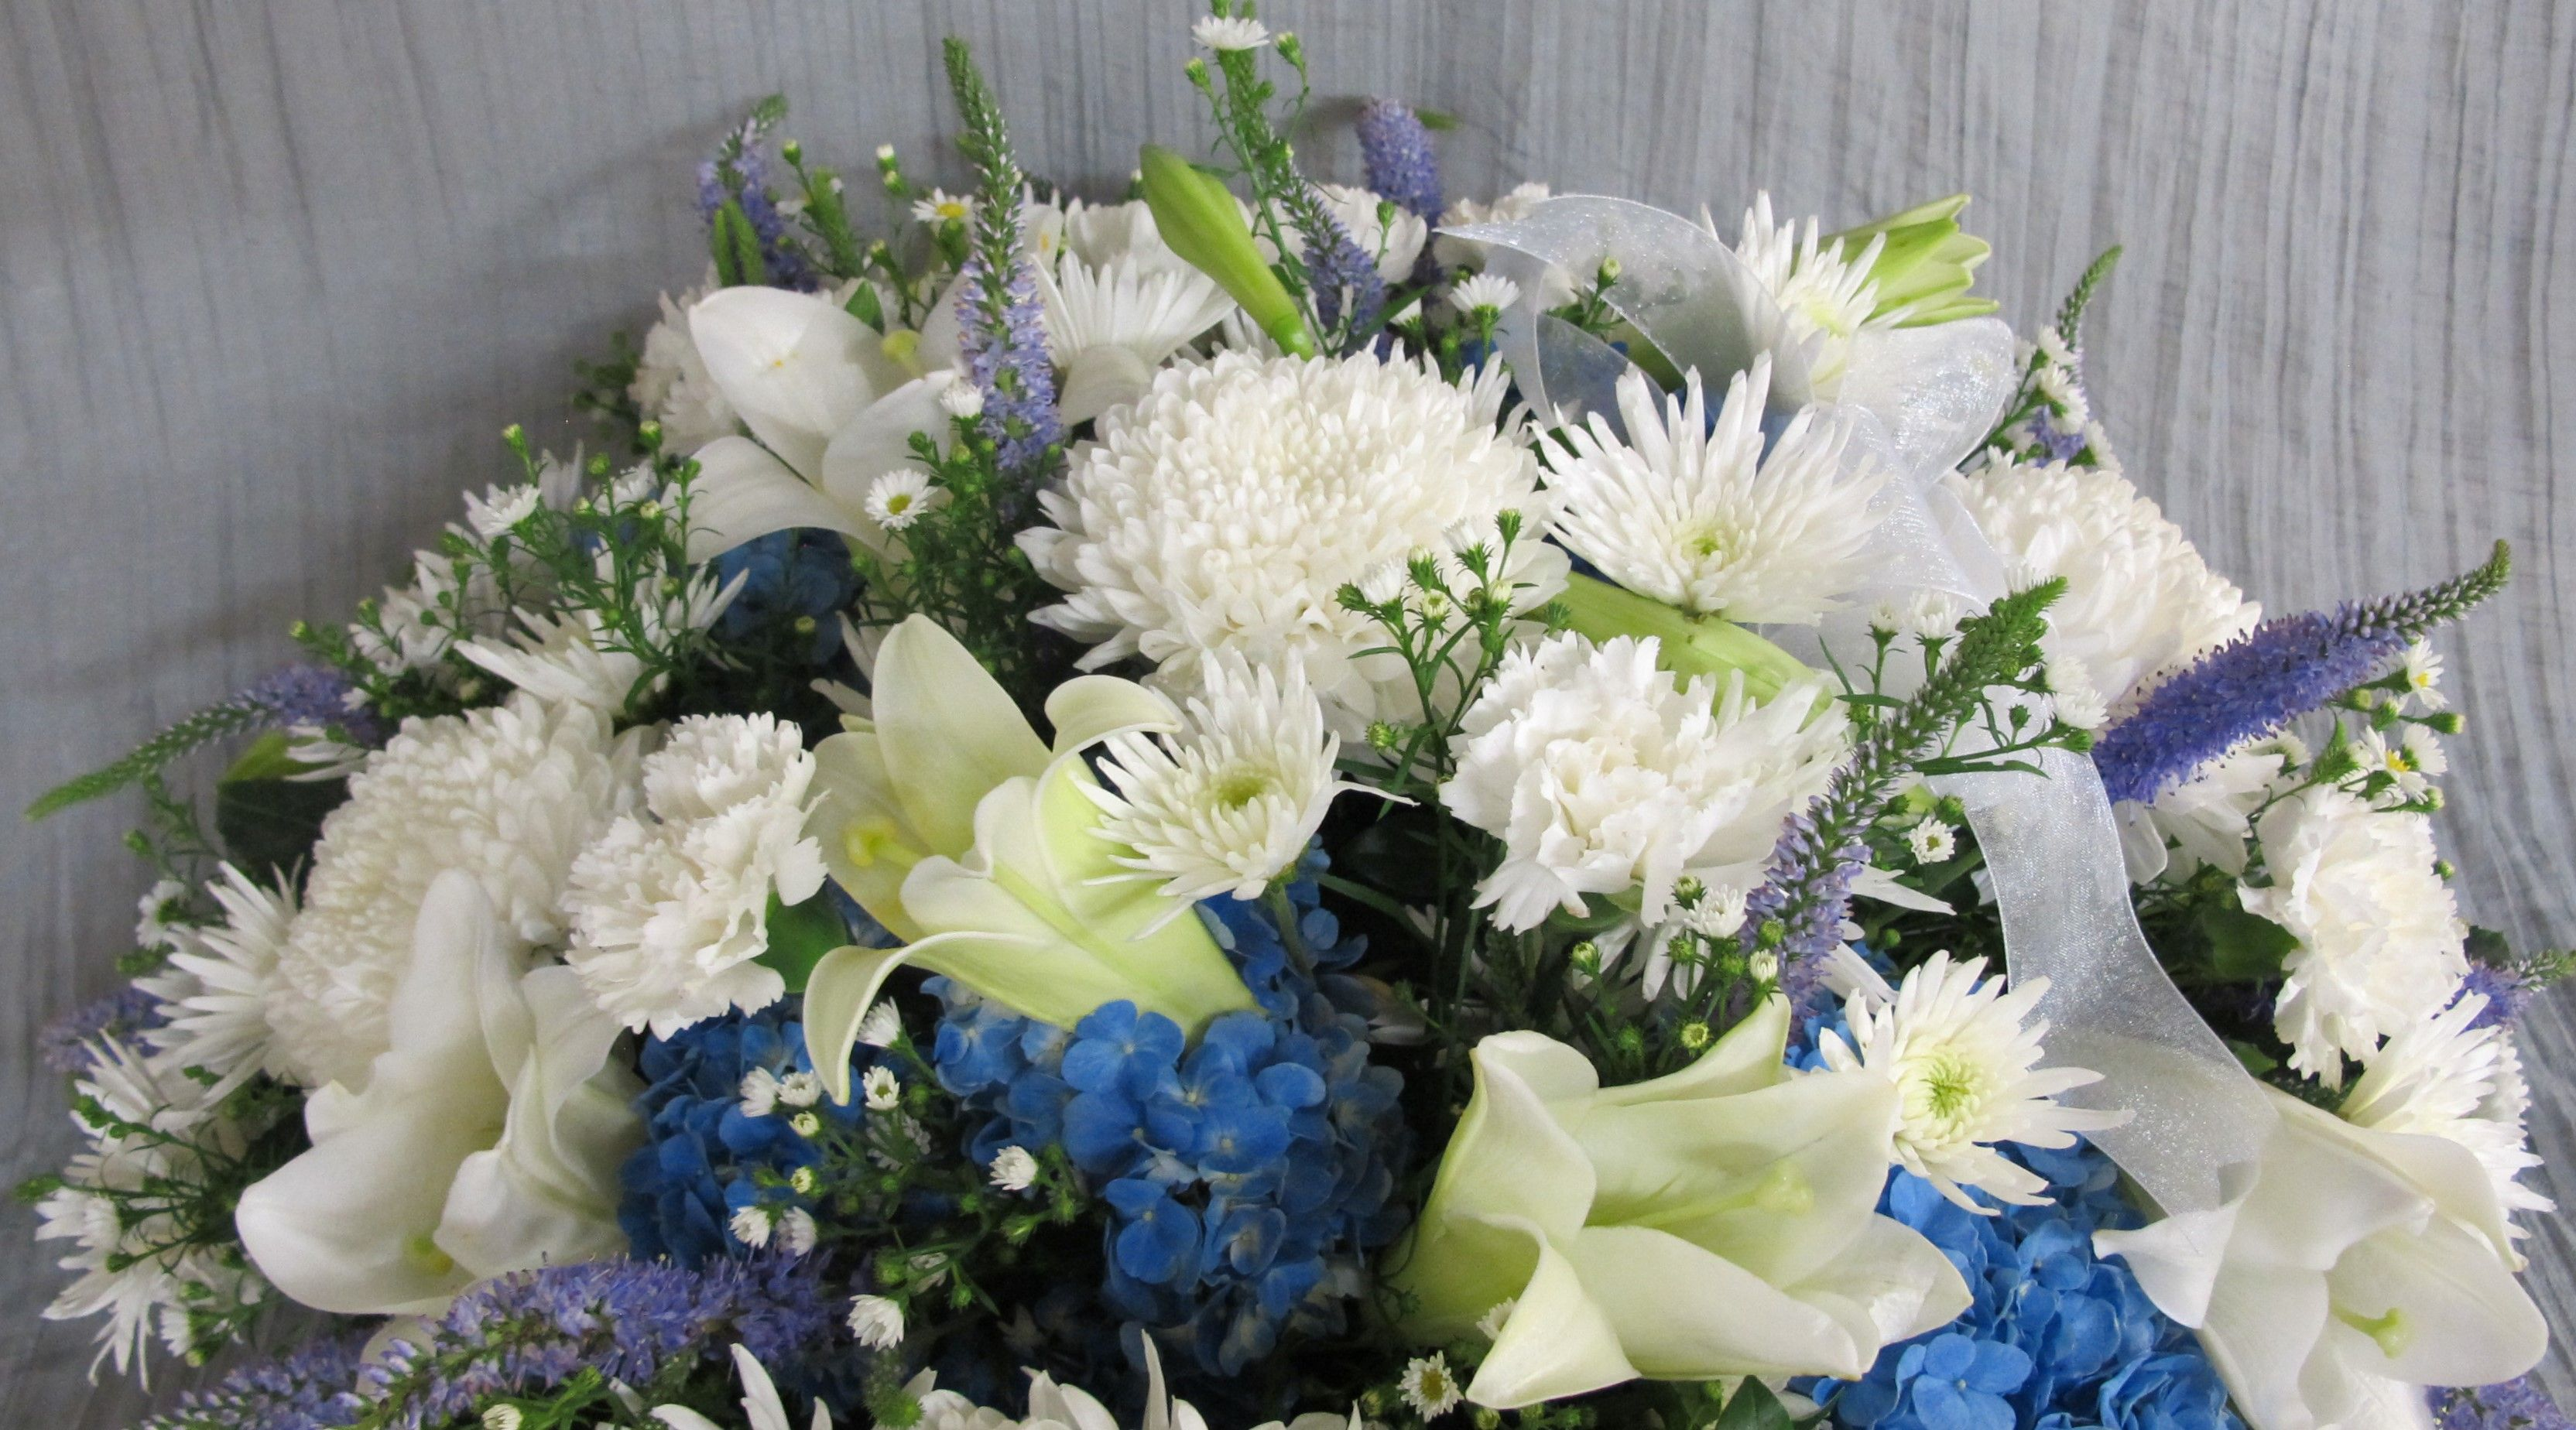 Wreath By Eros Florist Funeral Tributes Wreaths Pinterest